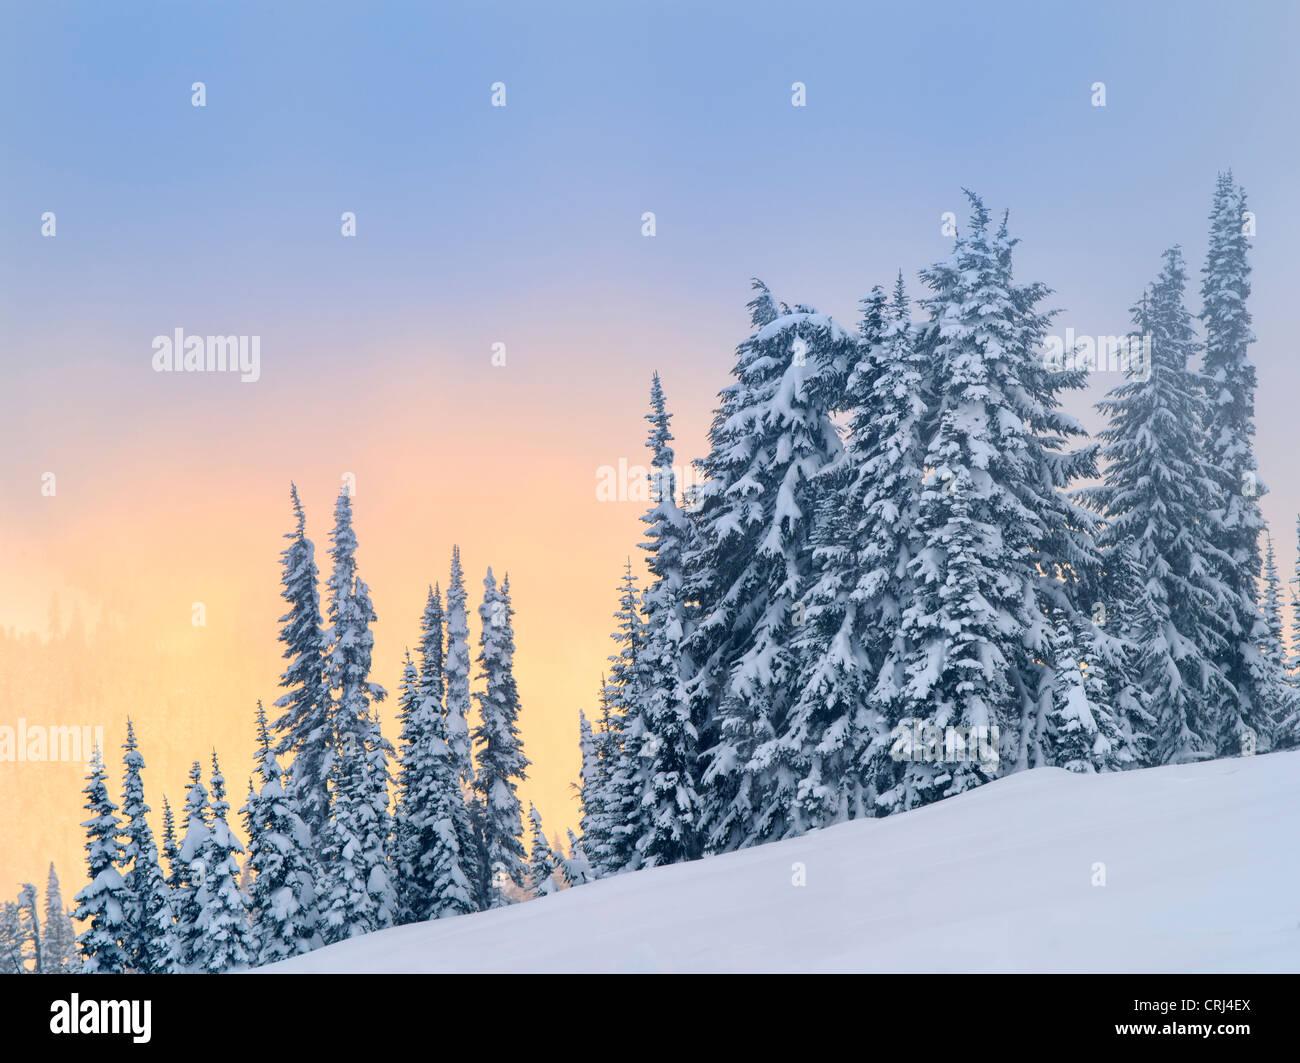 Snow on trees with sunset color. Mt. Rainier National Park, Washington - Stock Image